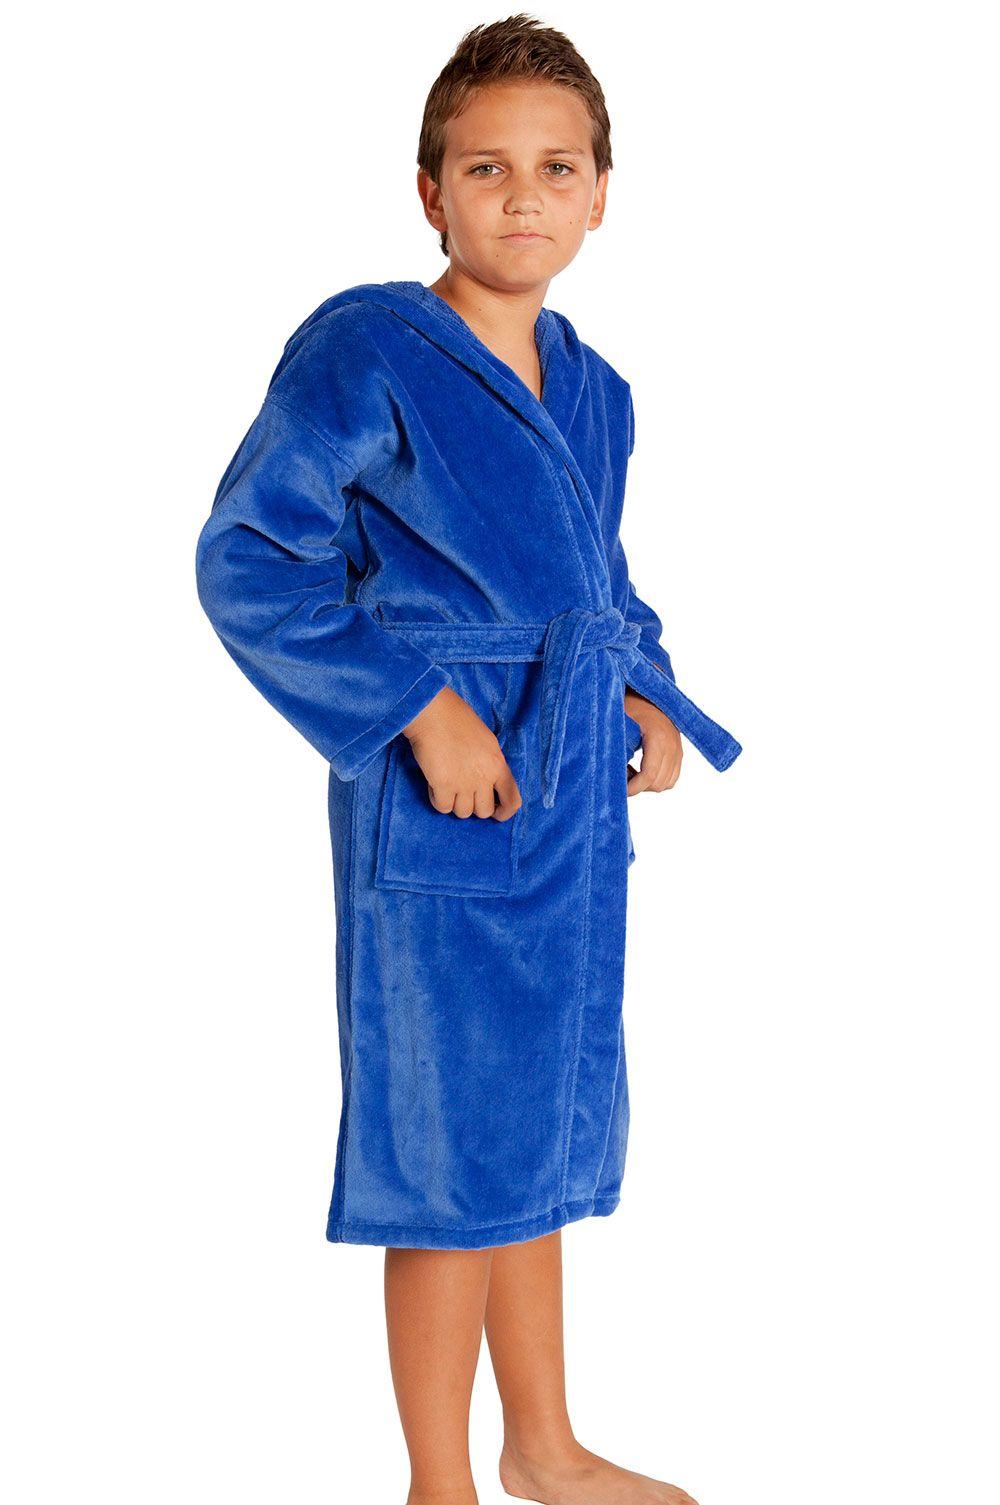 765903d4a1 Royal Blue Hooded Terry   Velour Kid s Bathrobe